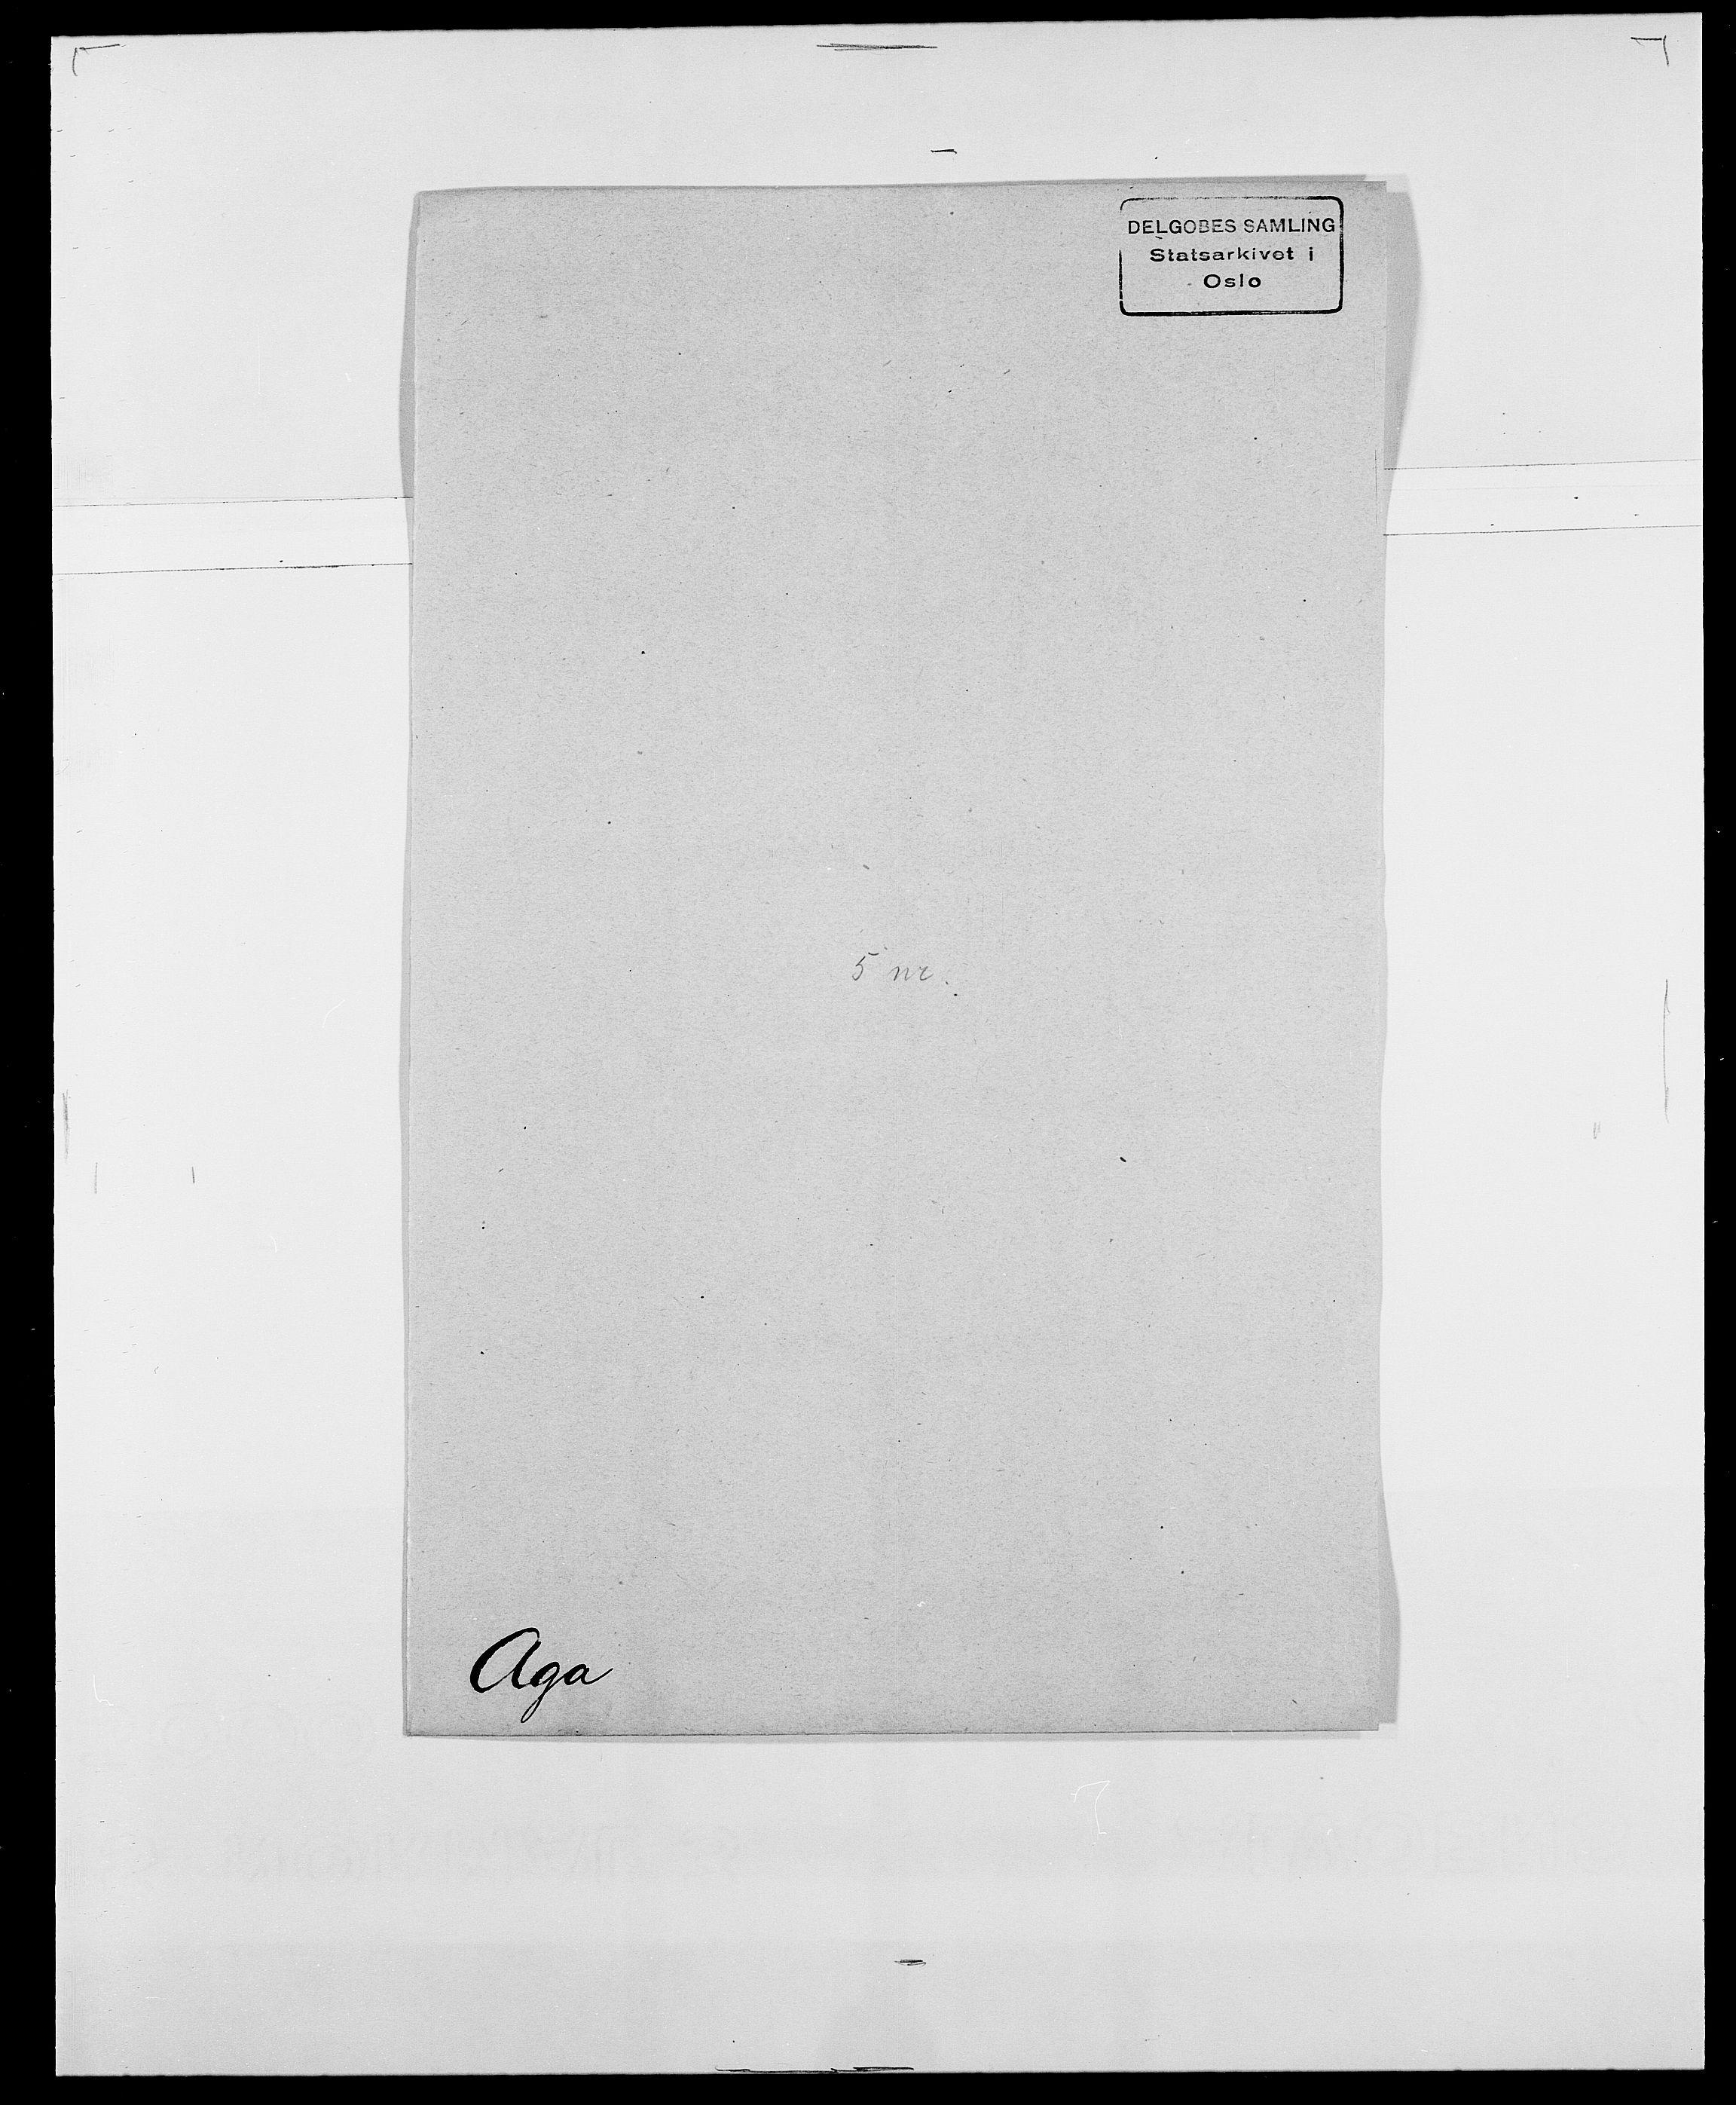 SAO, Delgobe, Charles Antoine - samling, D/Da/L0001: Aabye - Angerman, s. 283